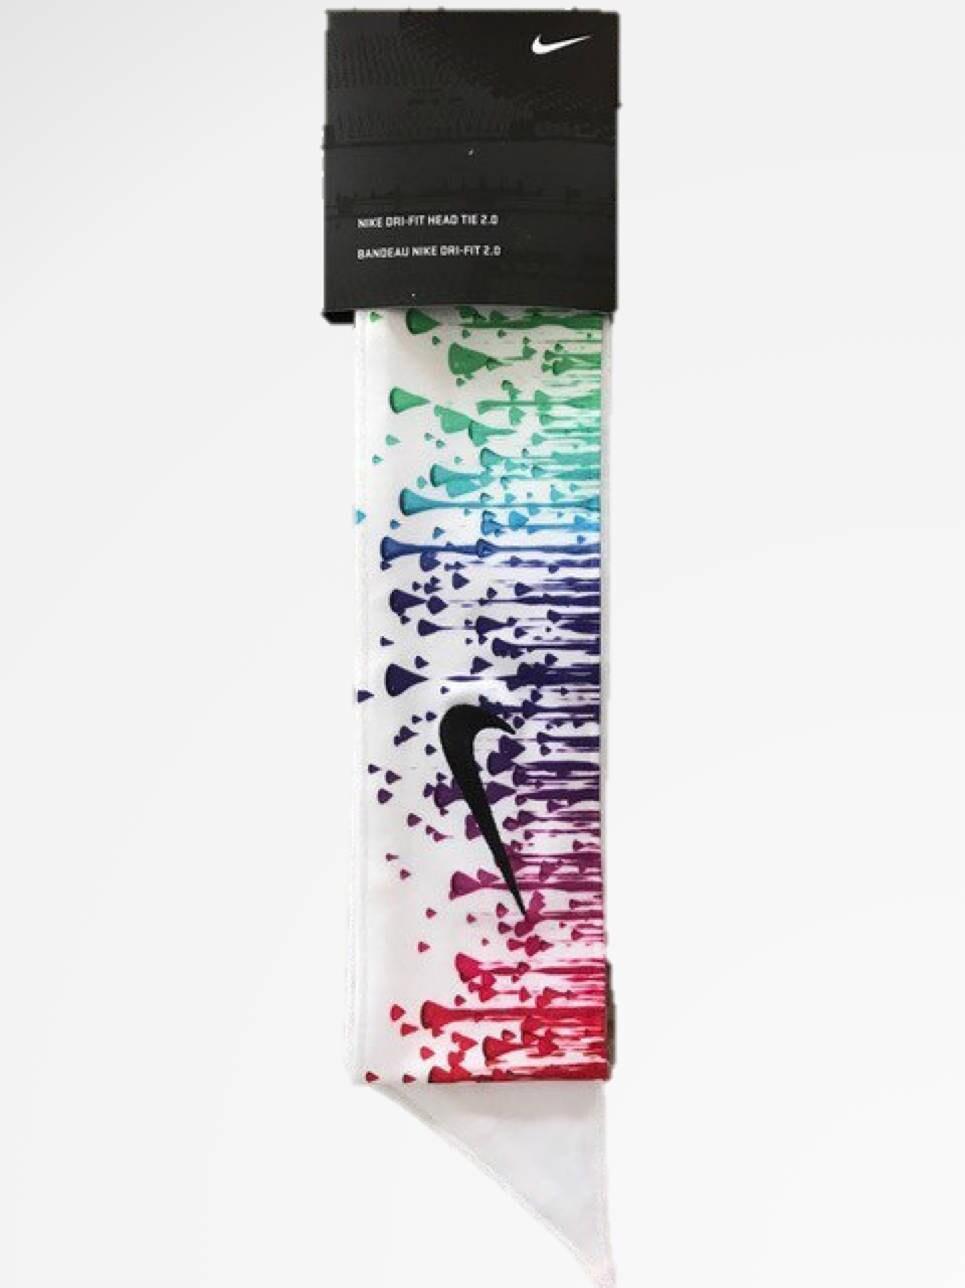 Custom Multi. Color Droplets Nike Dri-Fit Head Tie Headband  a8e190a698f